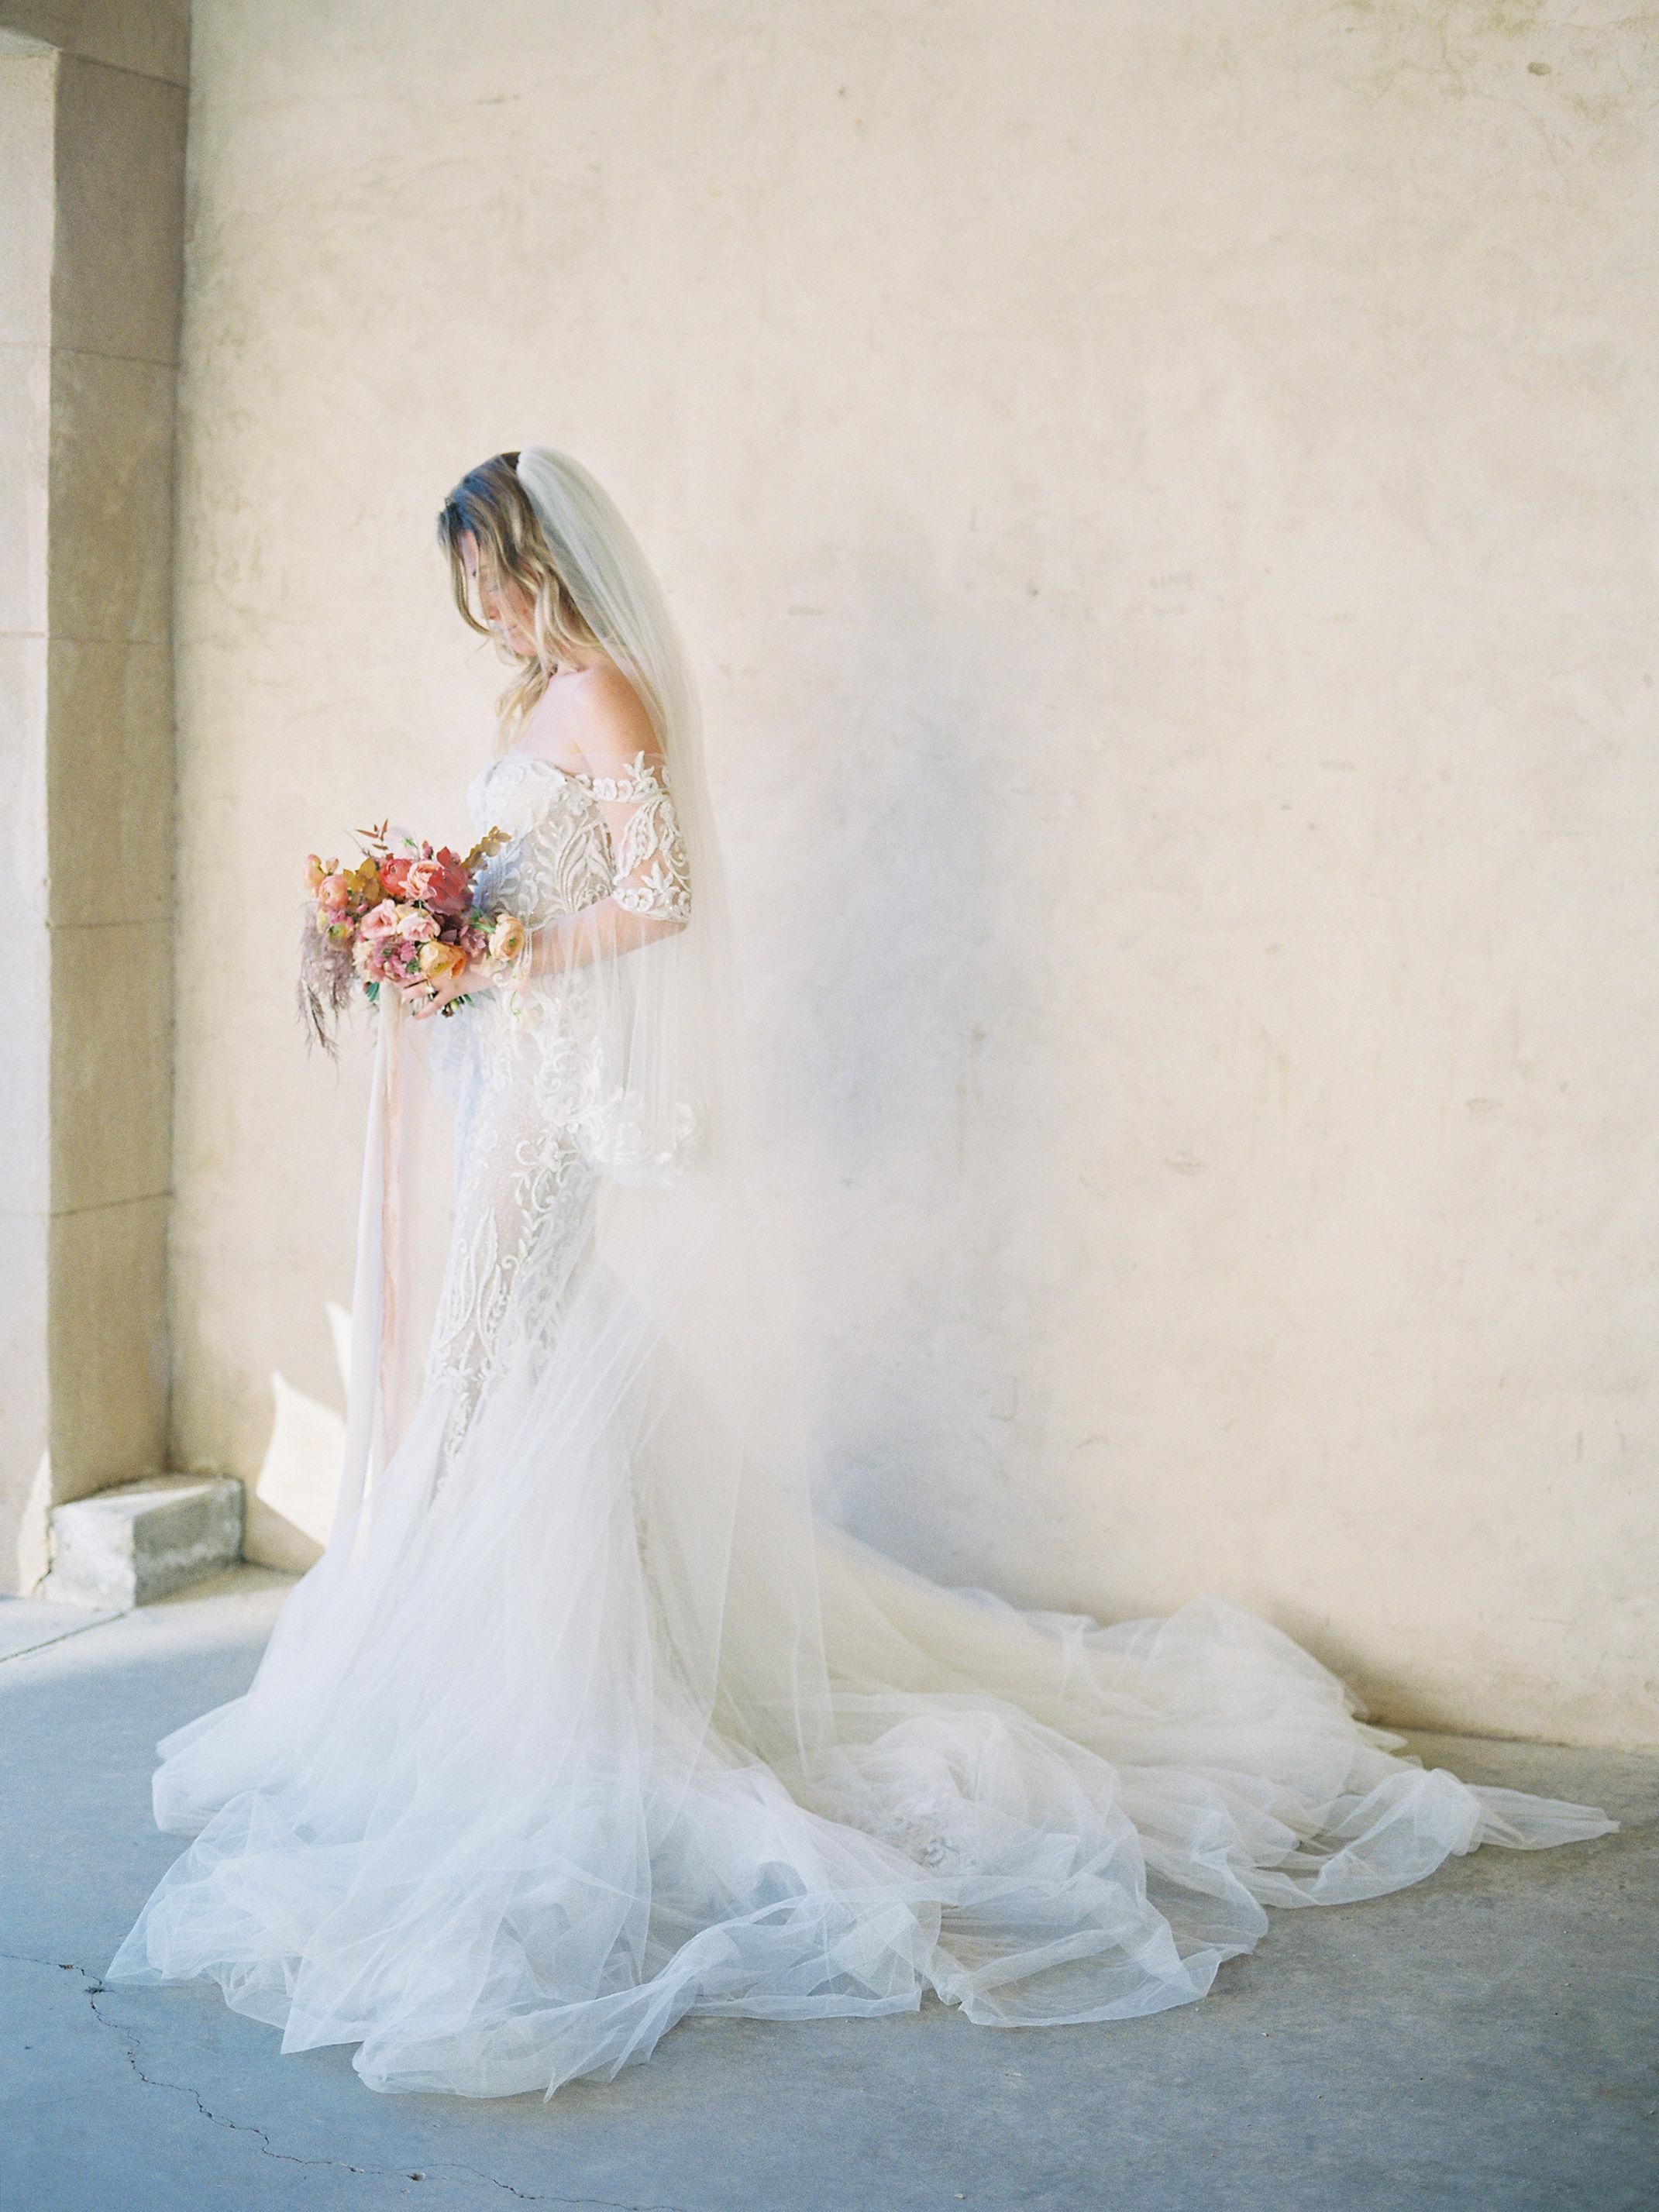 jessica-zimmerman-events-sunstone-bridal-bouquet-veil-gown.jpg